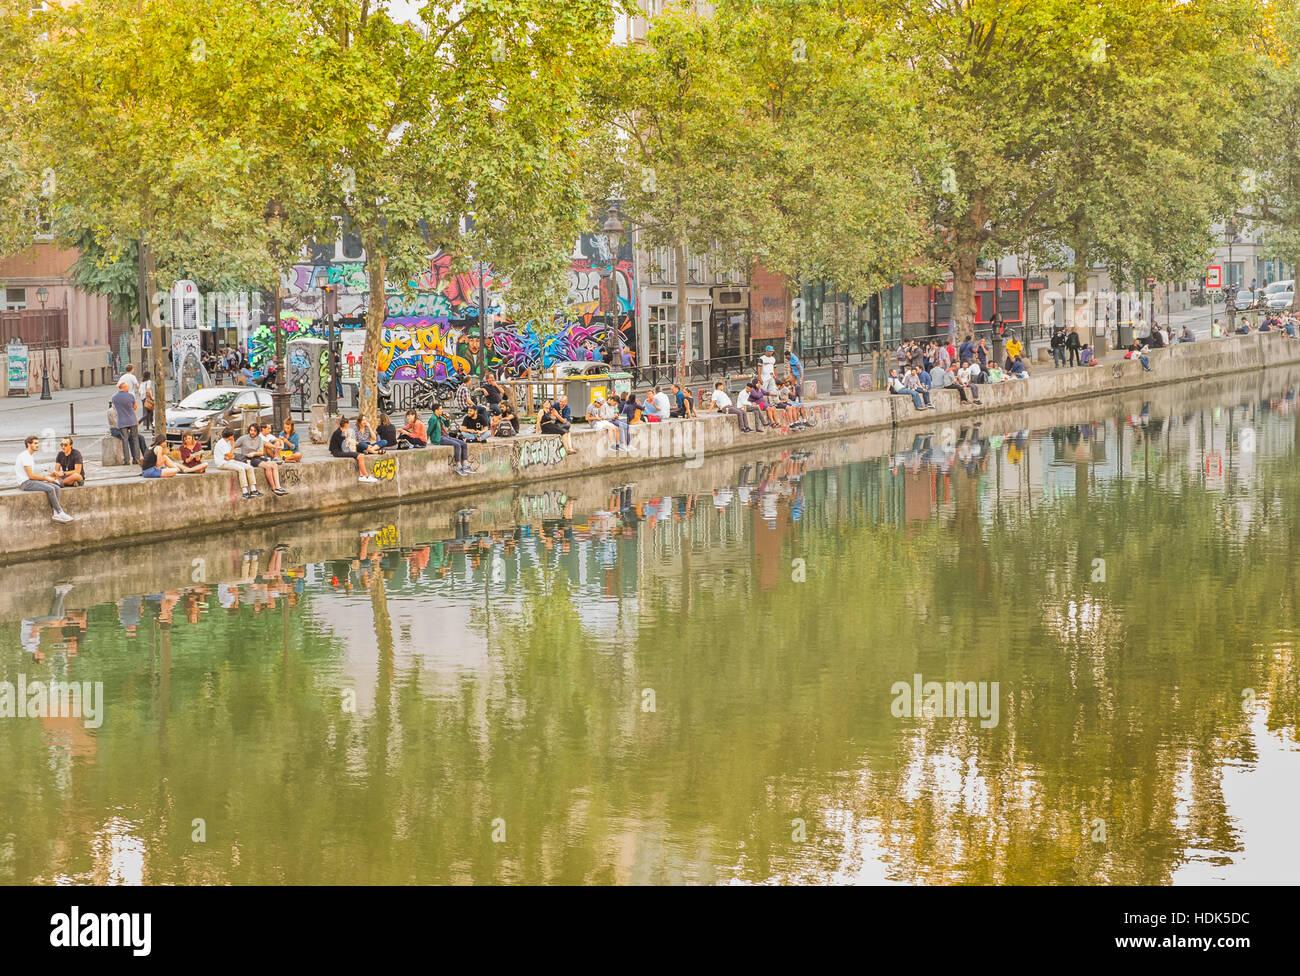 young people relaxing at canal saint-martin, quai de valmy - Stock Image